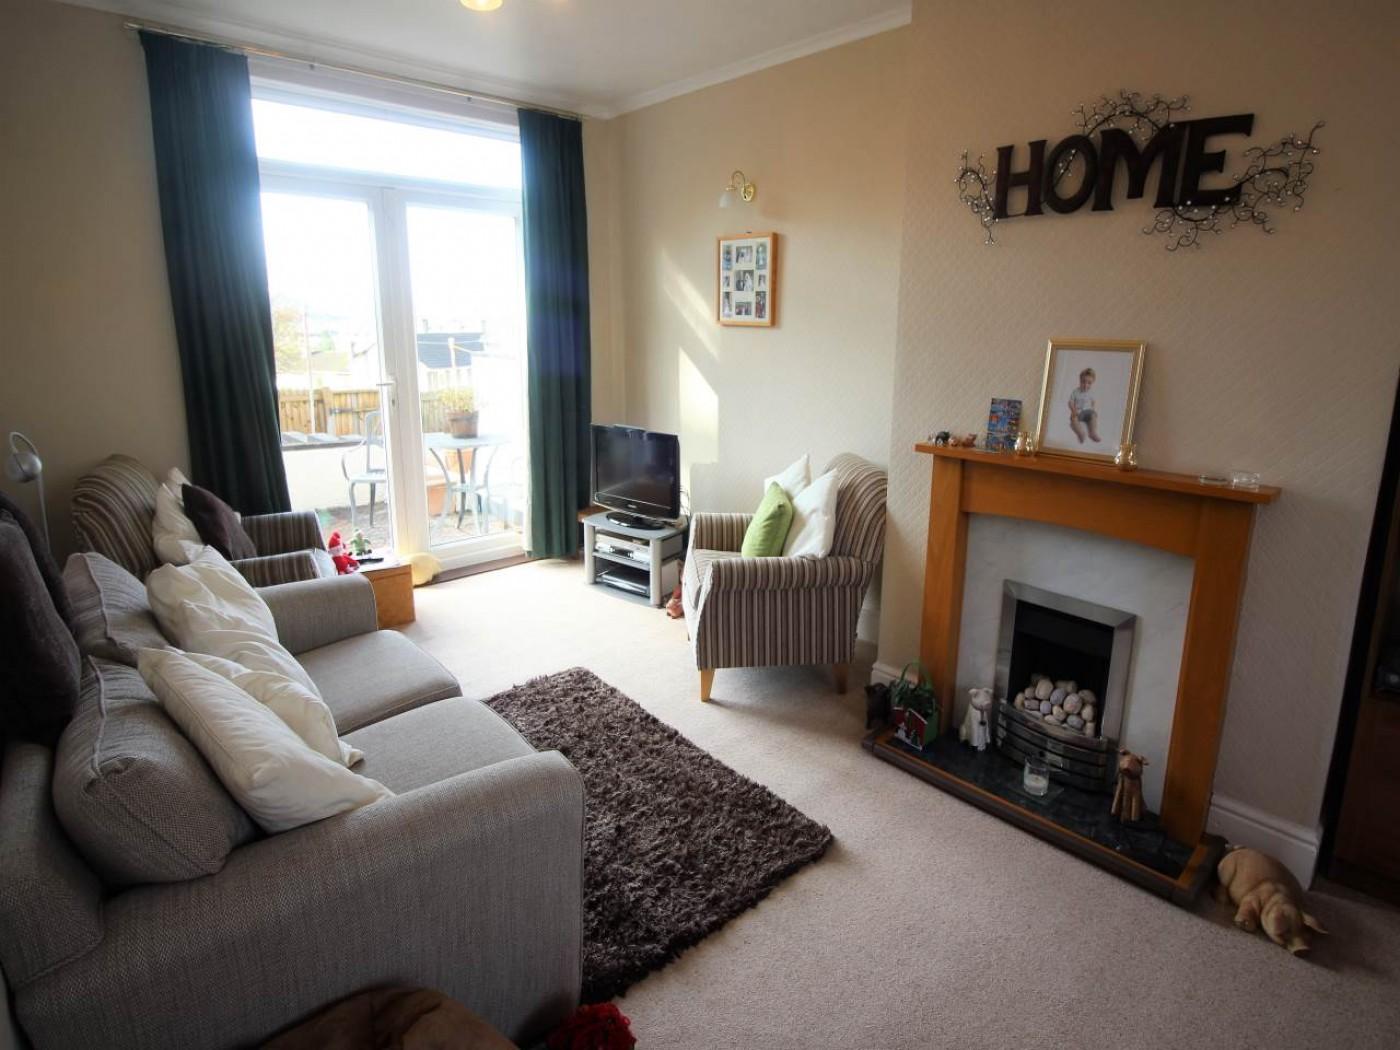 sofa malpas road newport score unlocked apk graig park 3 bedroom house